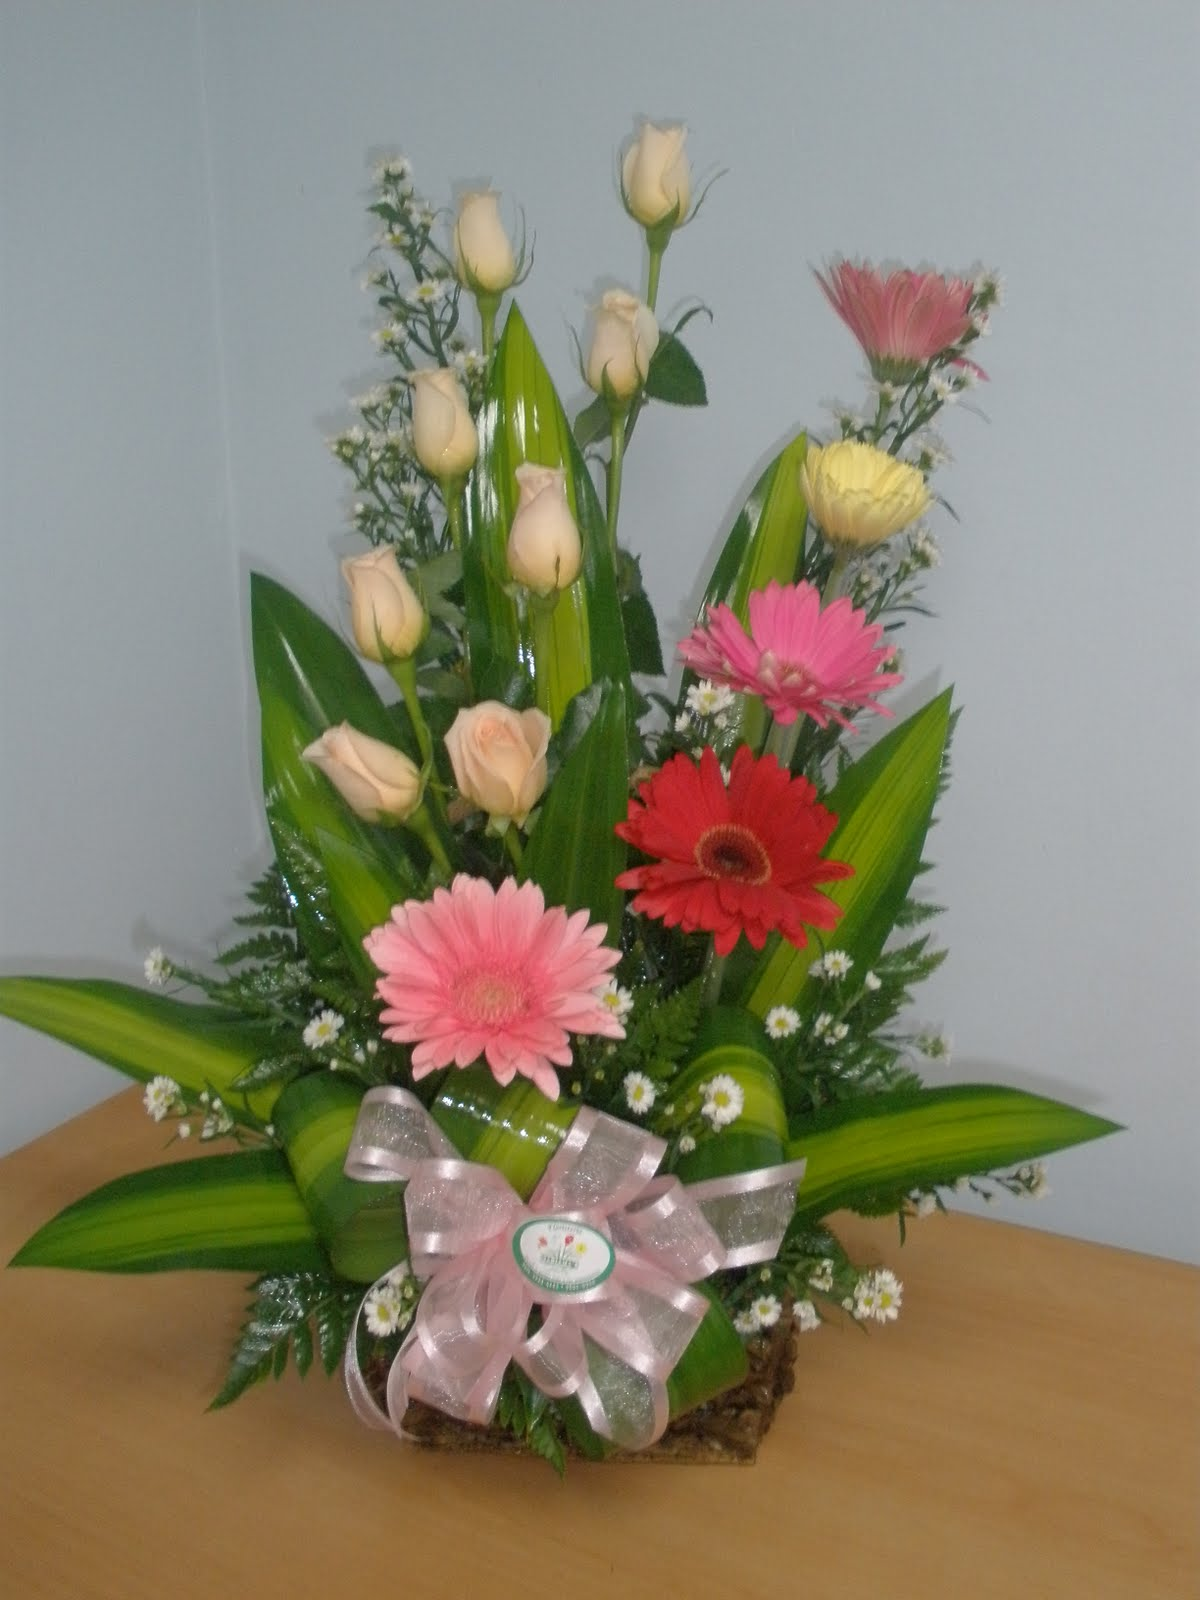 Arreglos de flores naturales auto design tech - Arreglos florales naturales ...